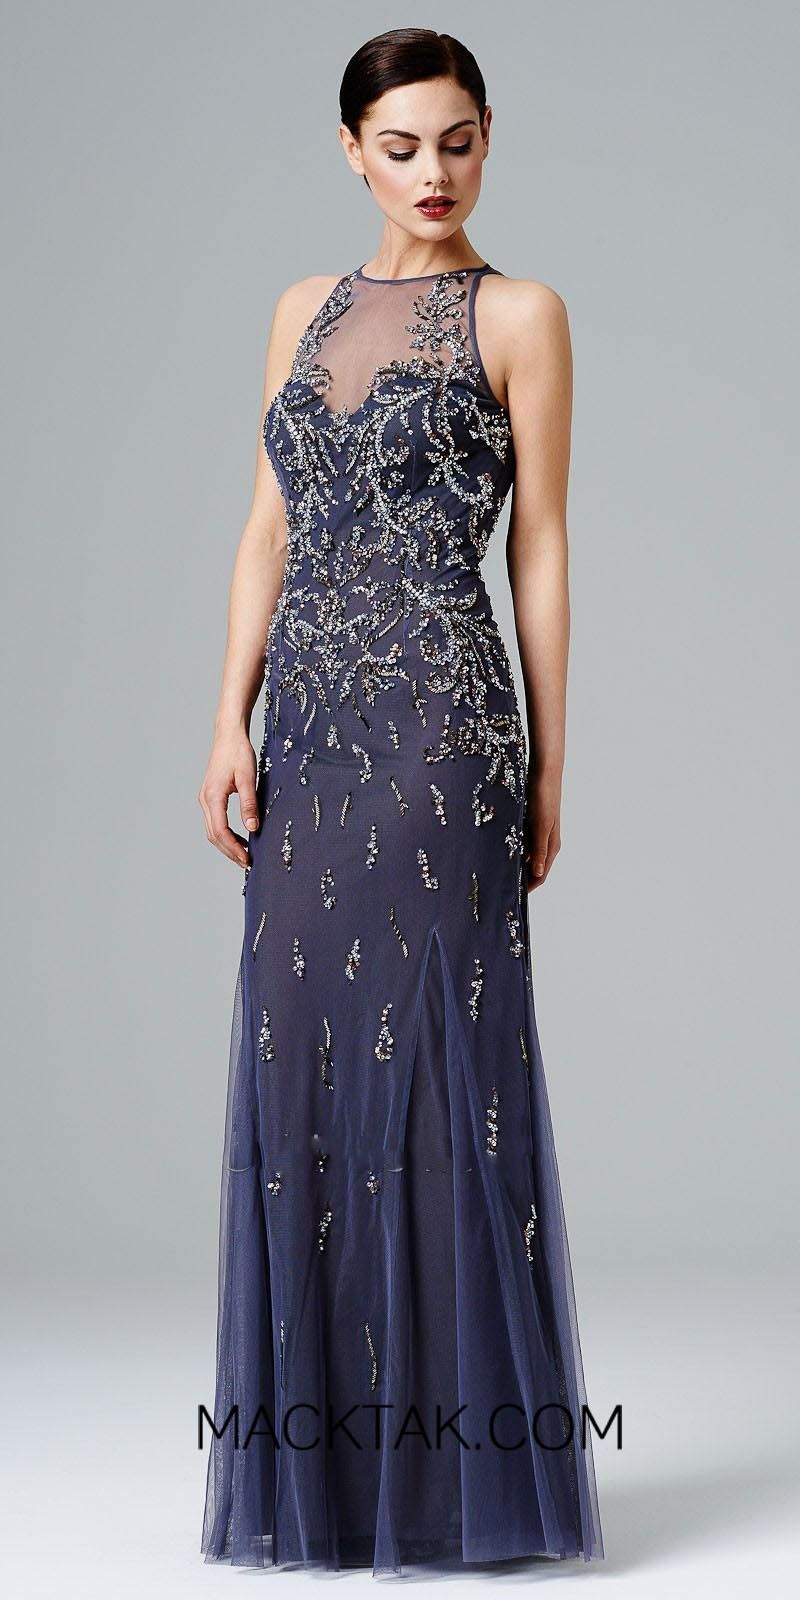 Aidan Mattox 459840 Dress | Katherine | Pinterest